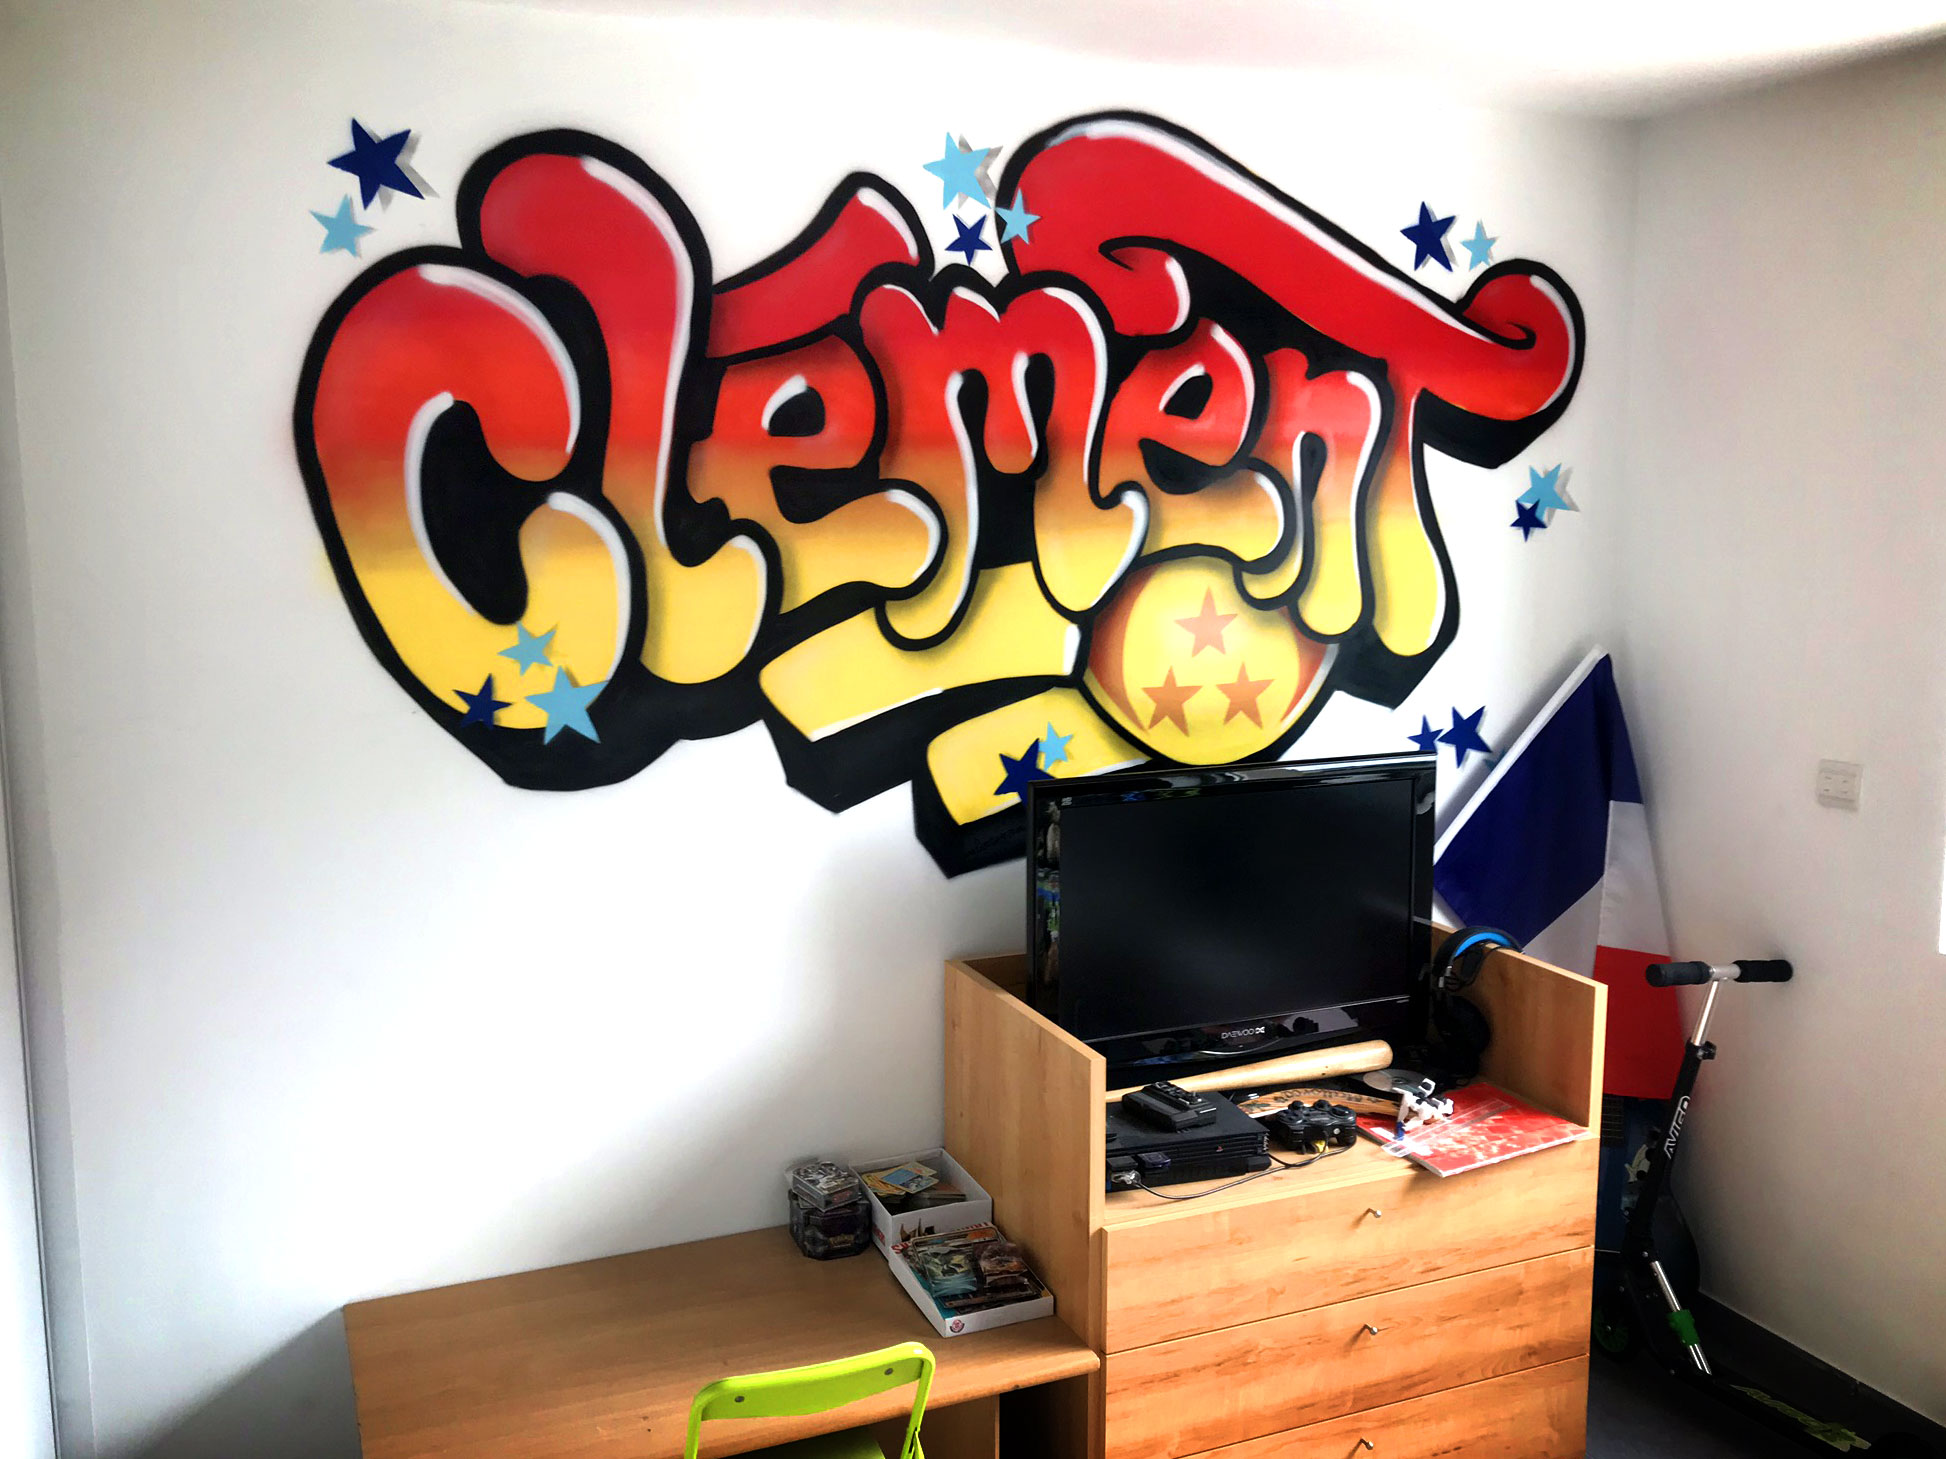 chambre-graffiti-geograffeur